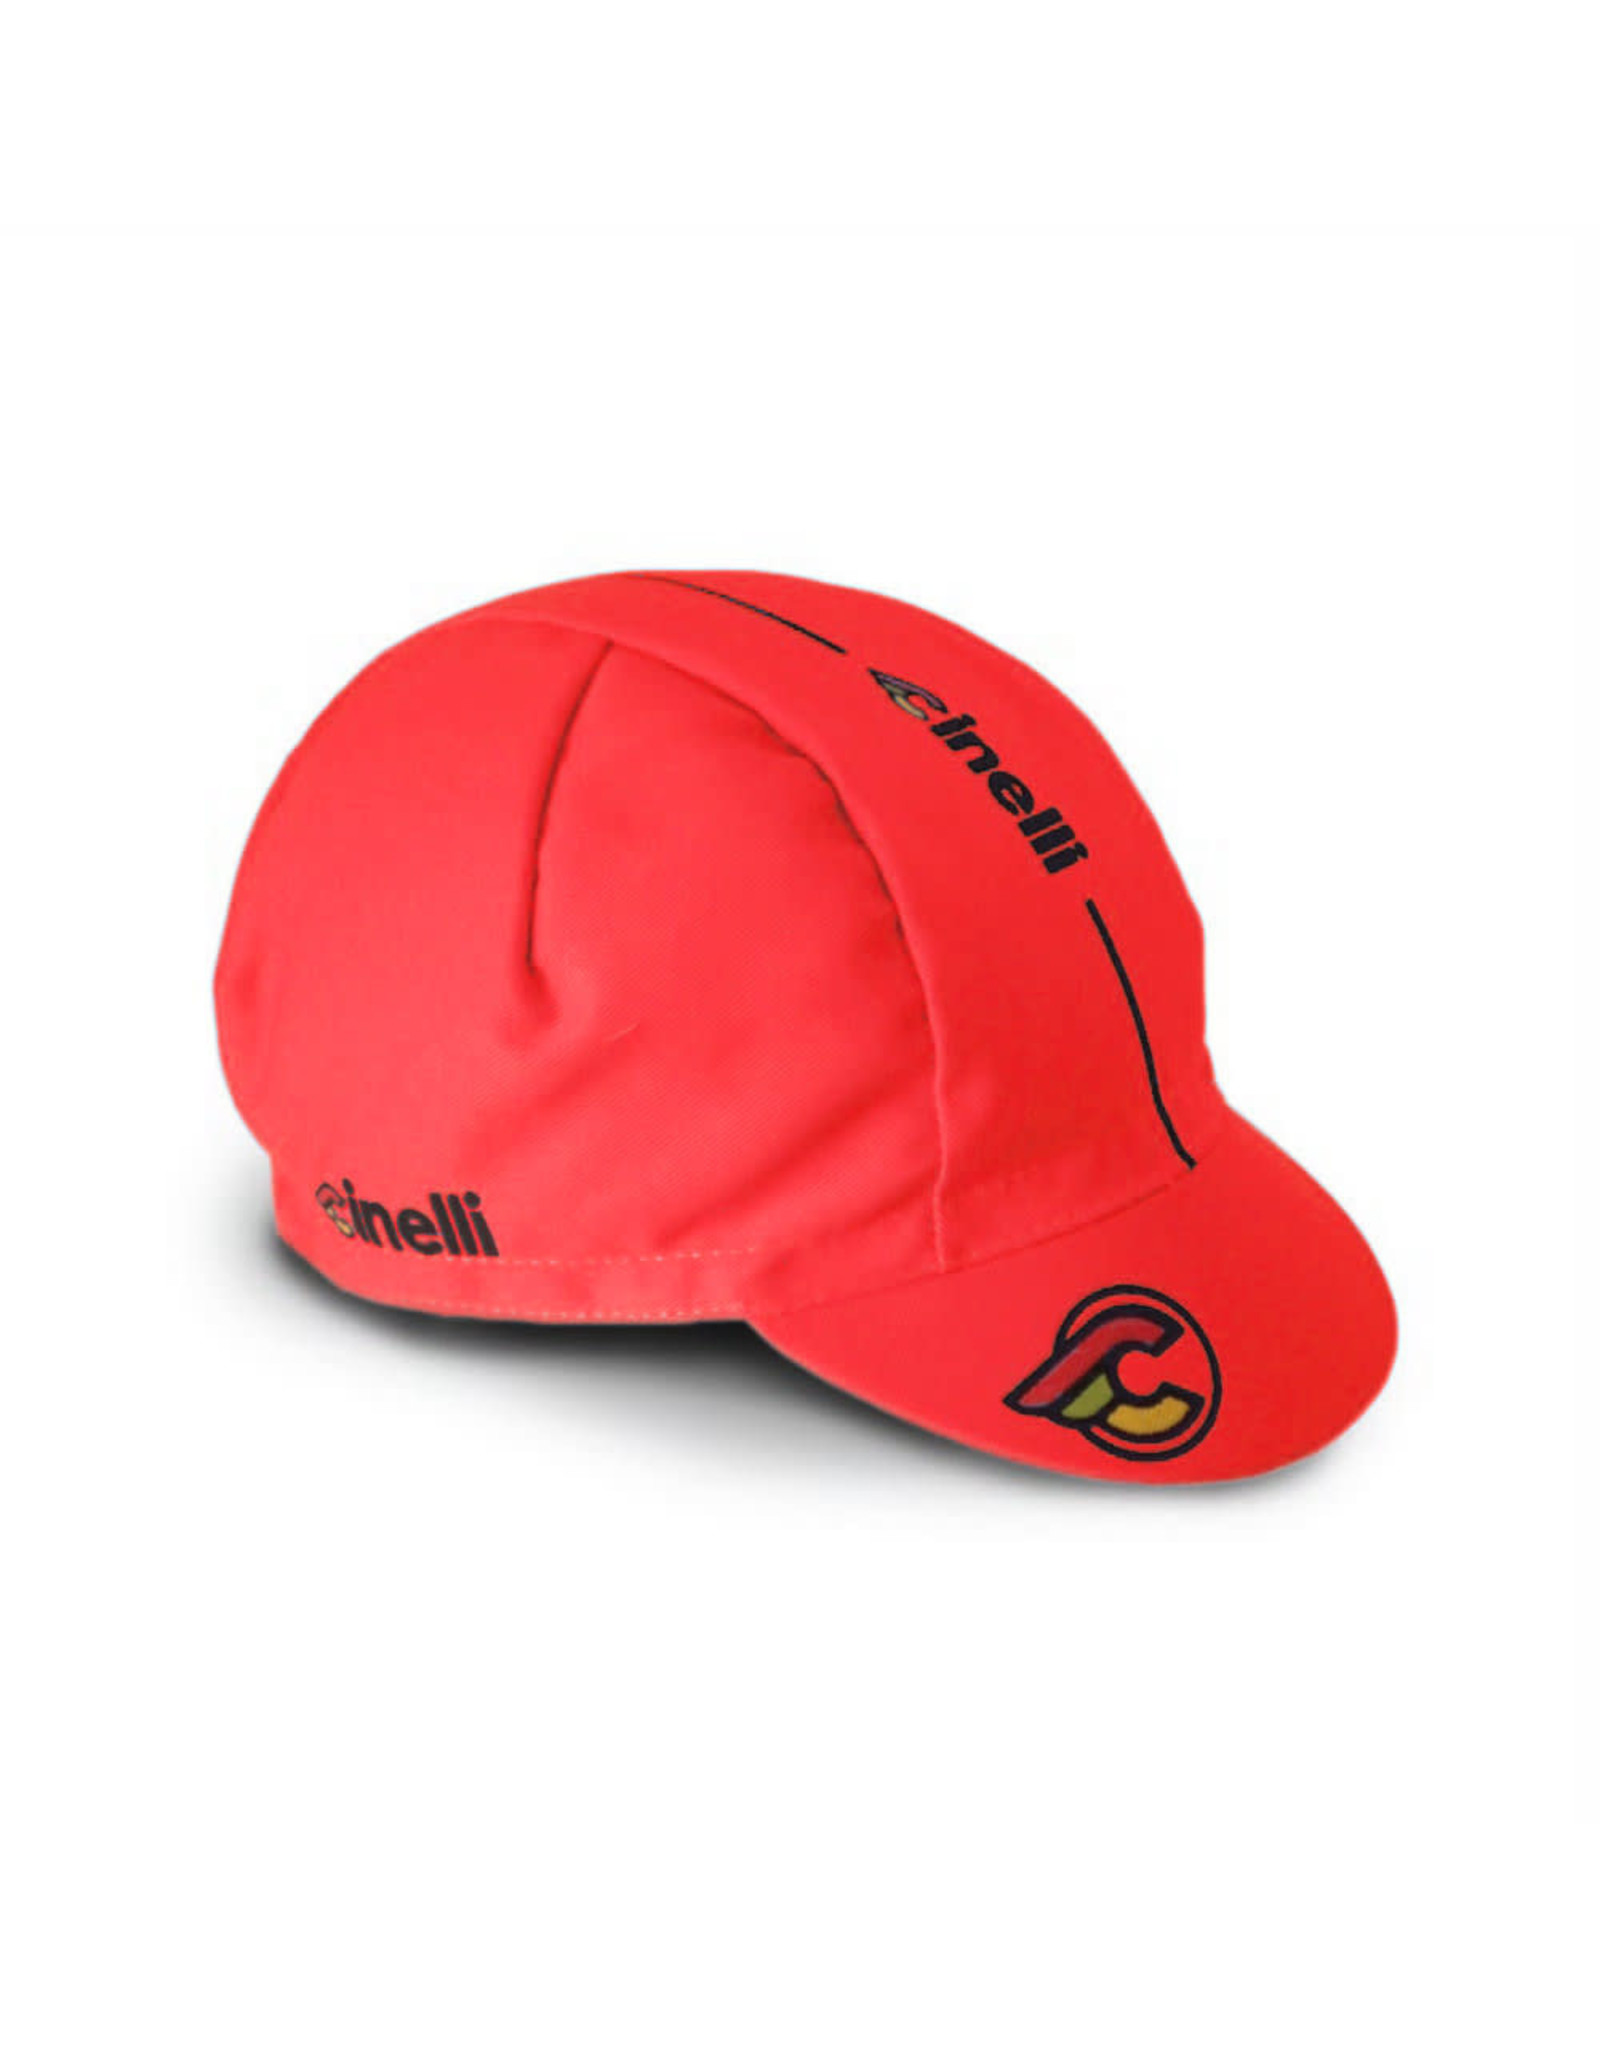 Cinelli Cycling Cap Red UNI